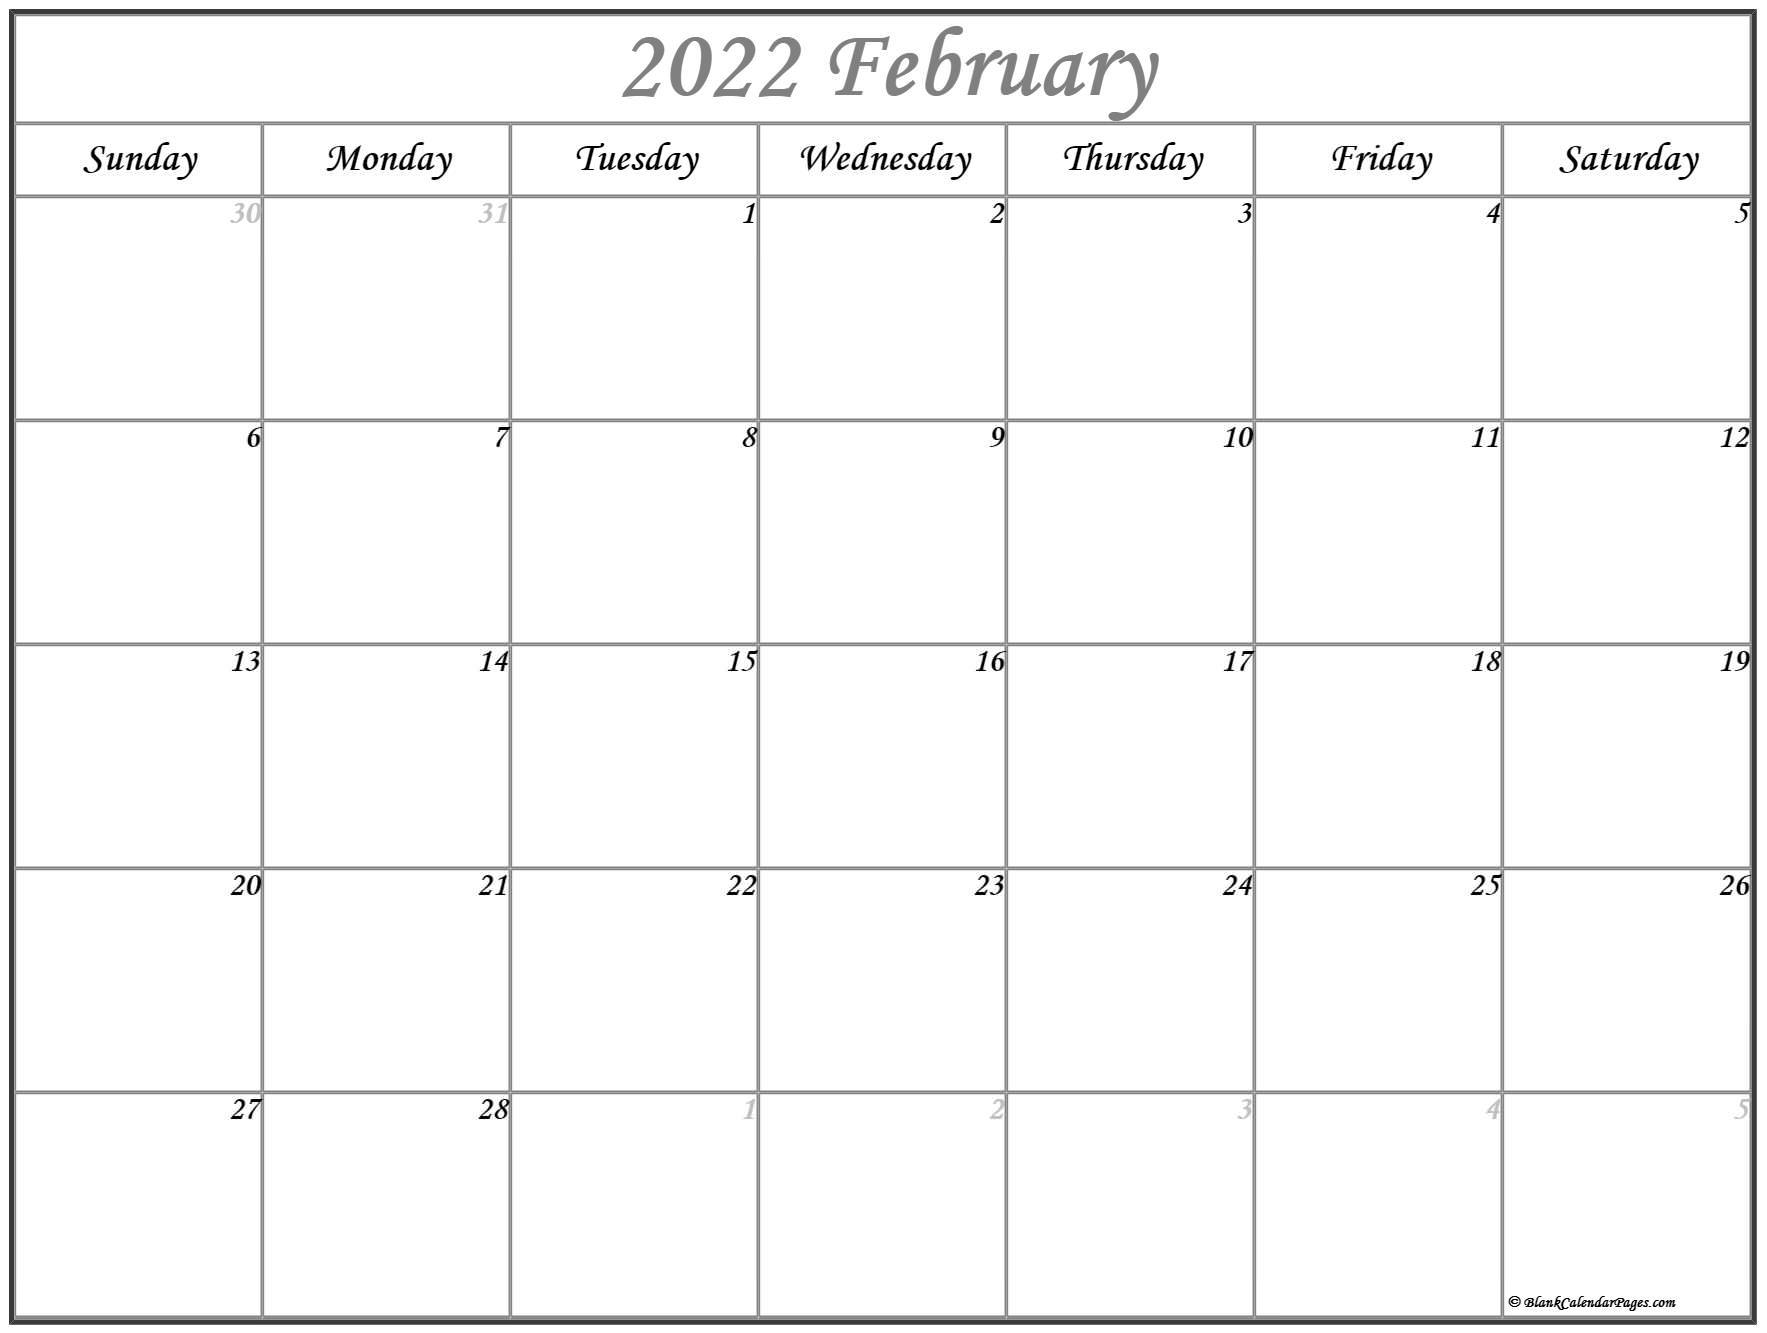 February 2022 Calendar | Free Printable Calendar Templates For Blank Calendar For February 2022